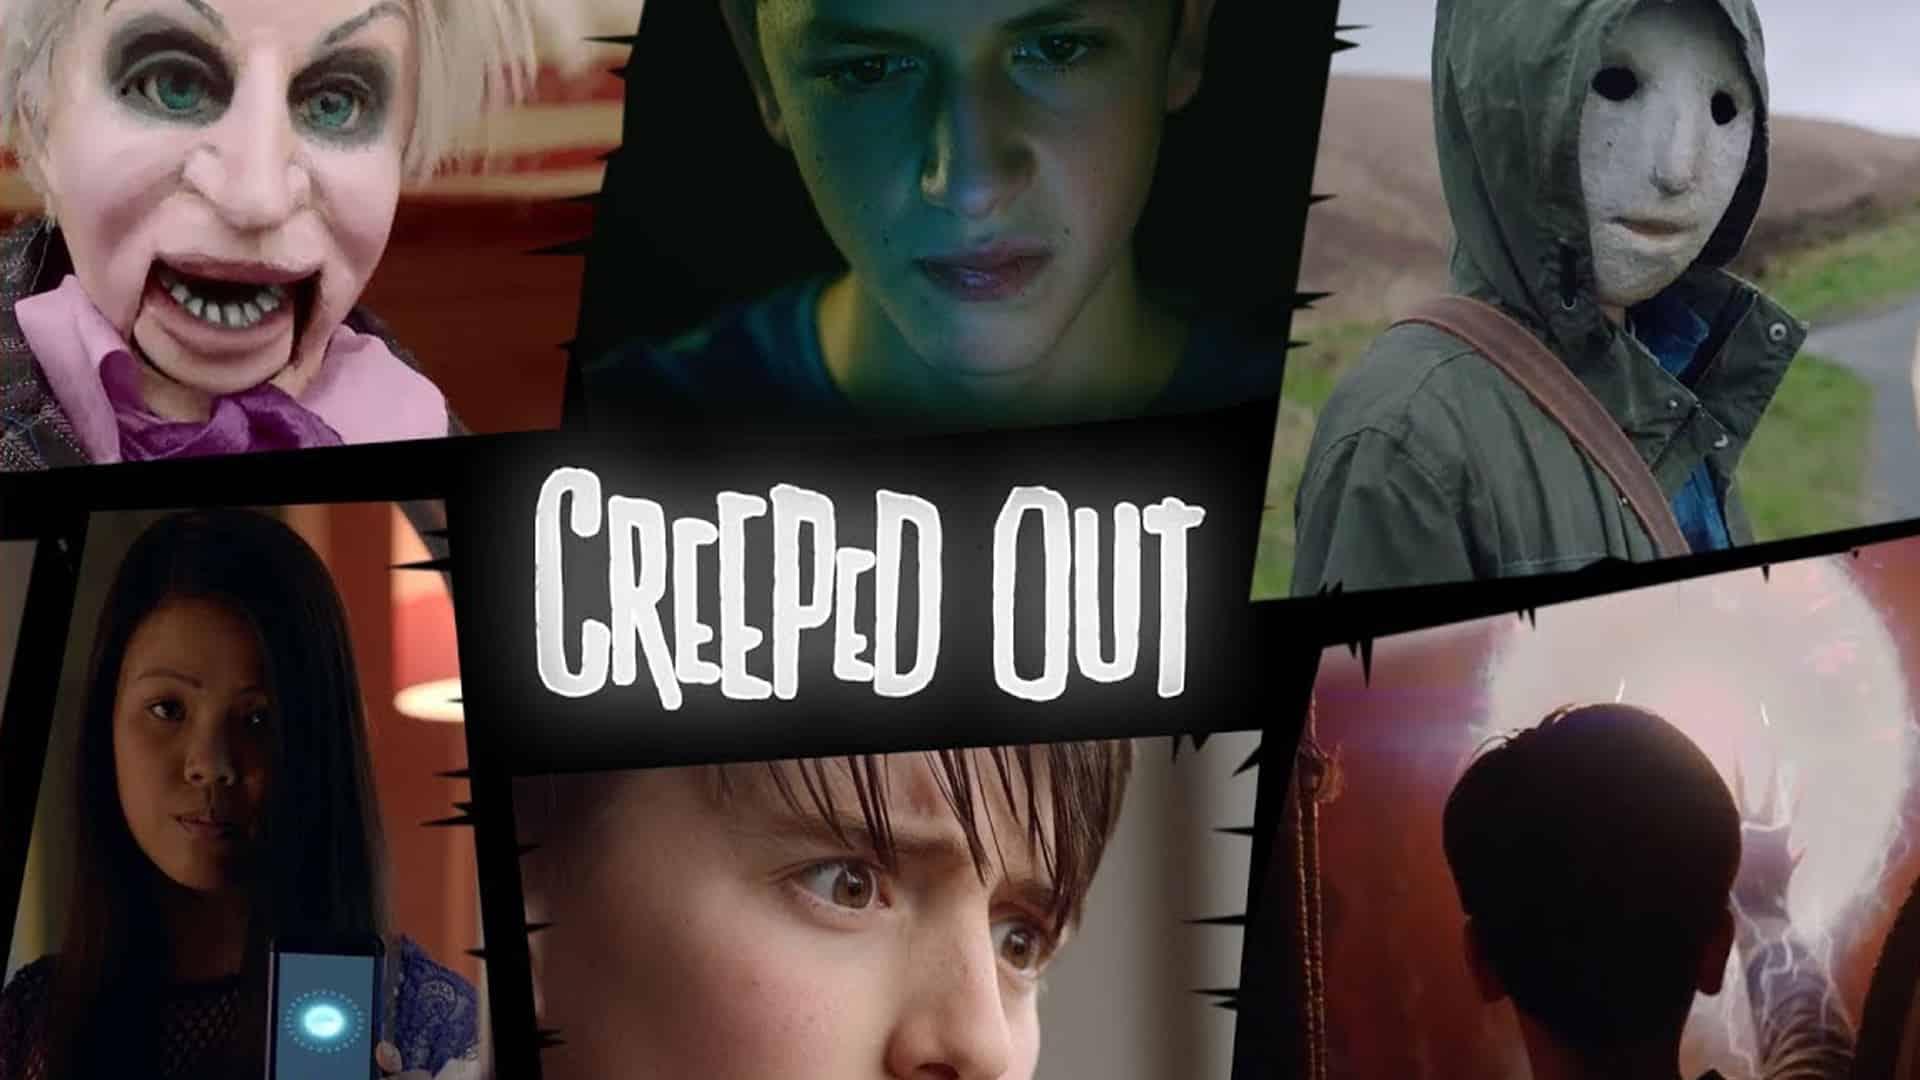 Risultati immagini per Creeped Out: racconti di paura